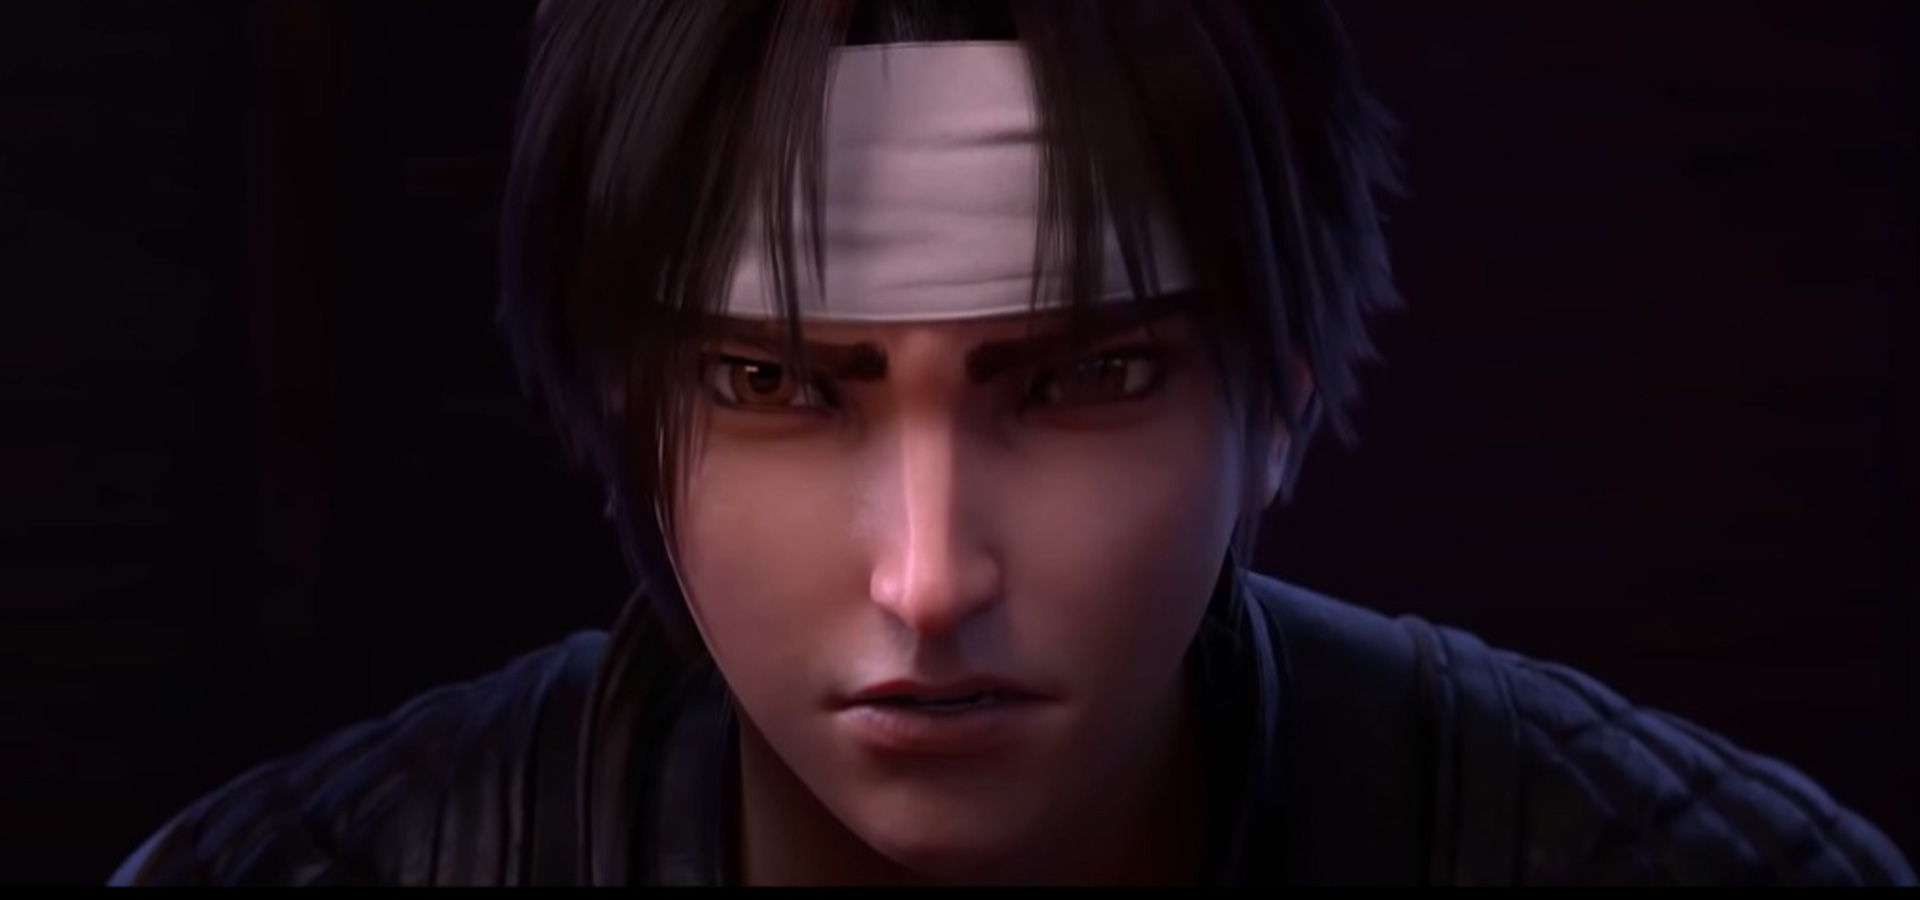 Un trailer pour le film d'animation The King of Fighters : Awaken